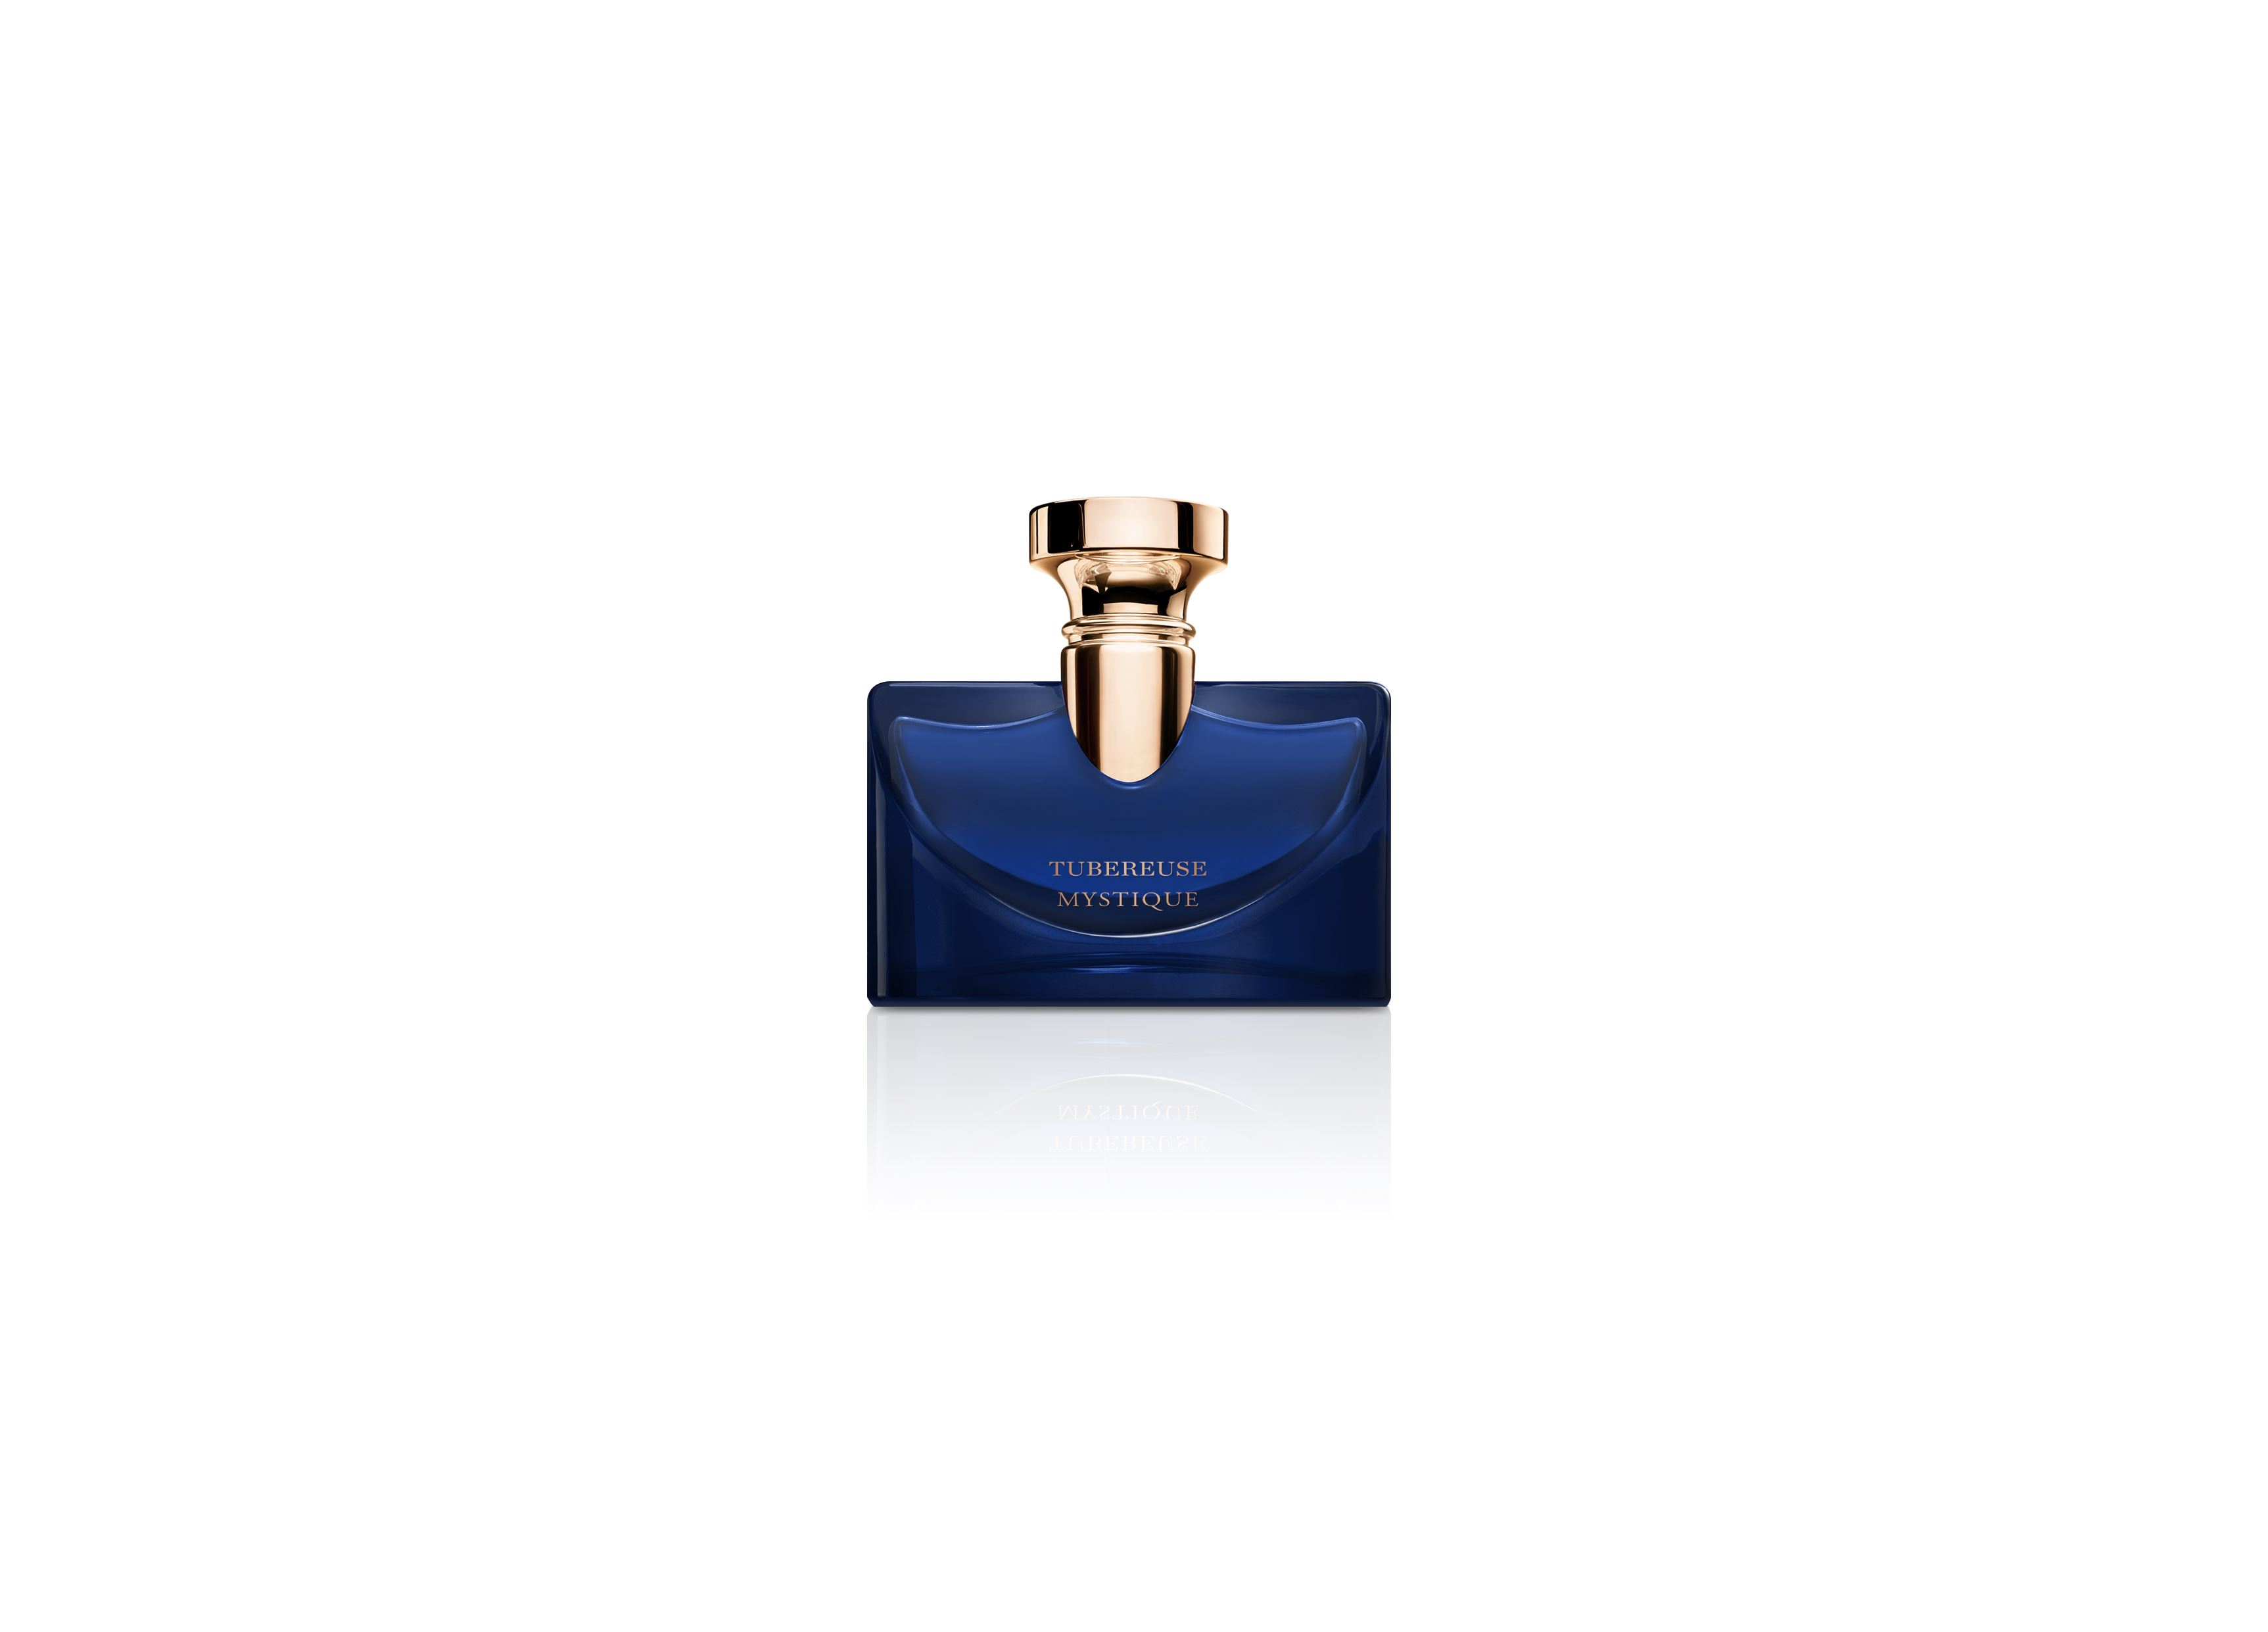 Bvlgari | Splendida Tubereuse Mystique Eau de Parfum 30 ML